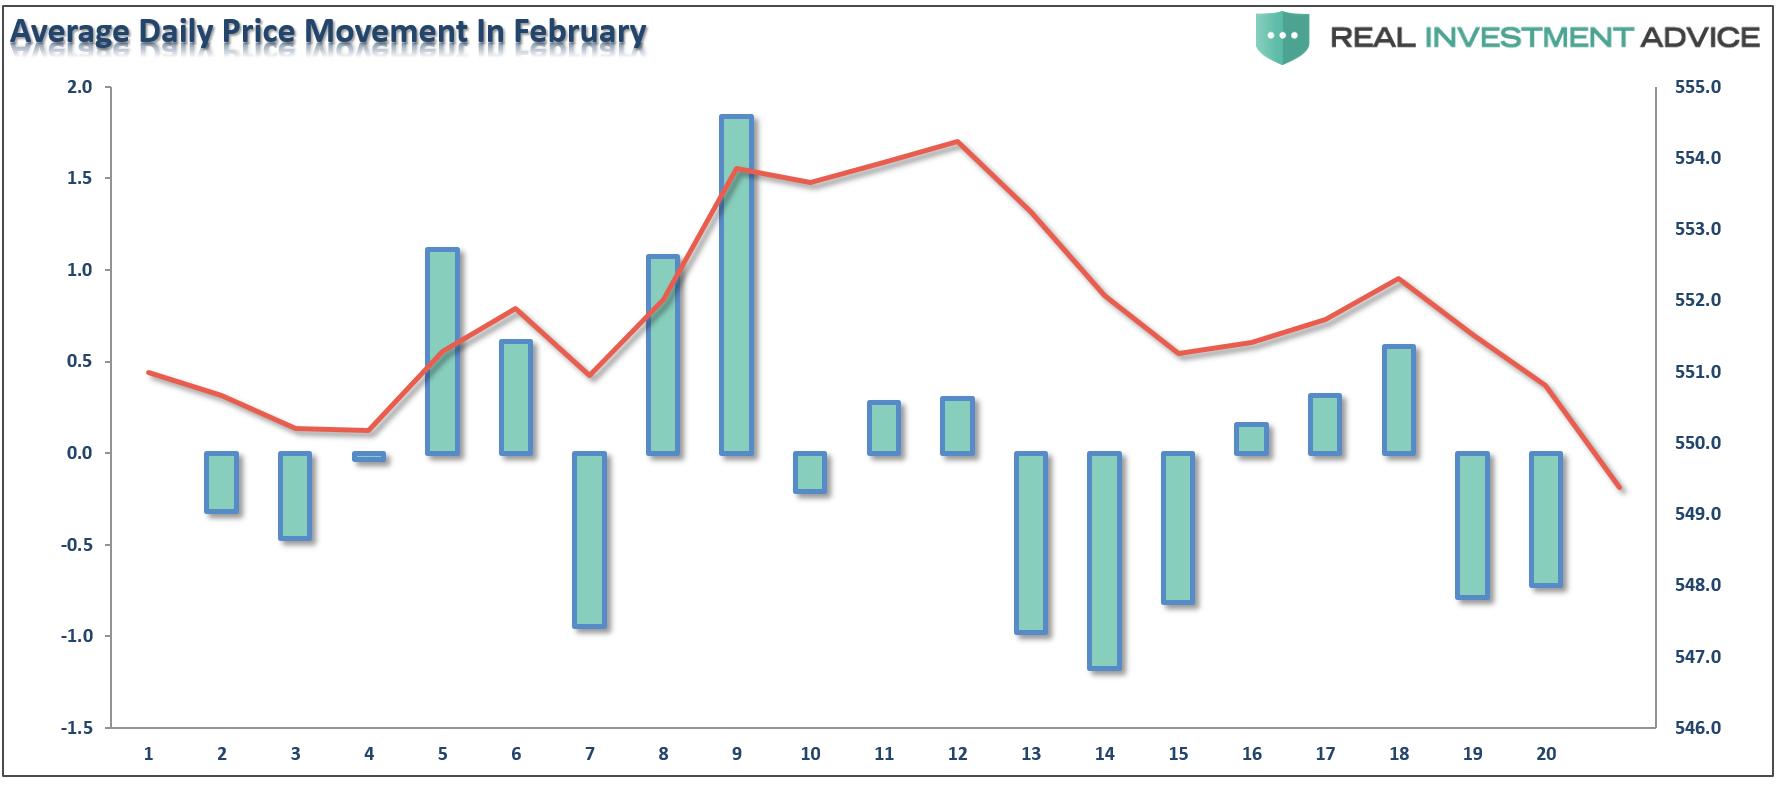 Past February Price Movement